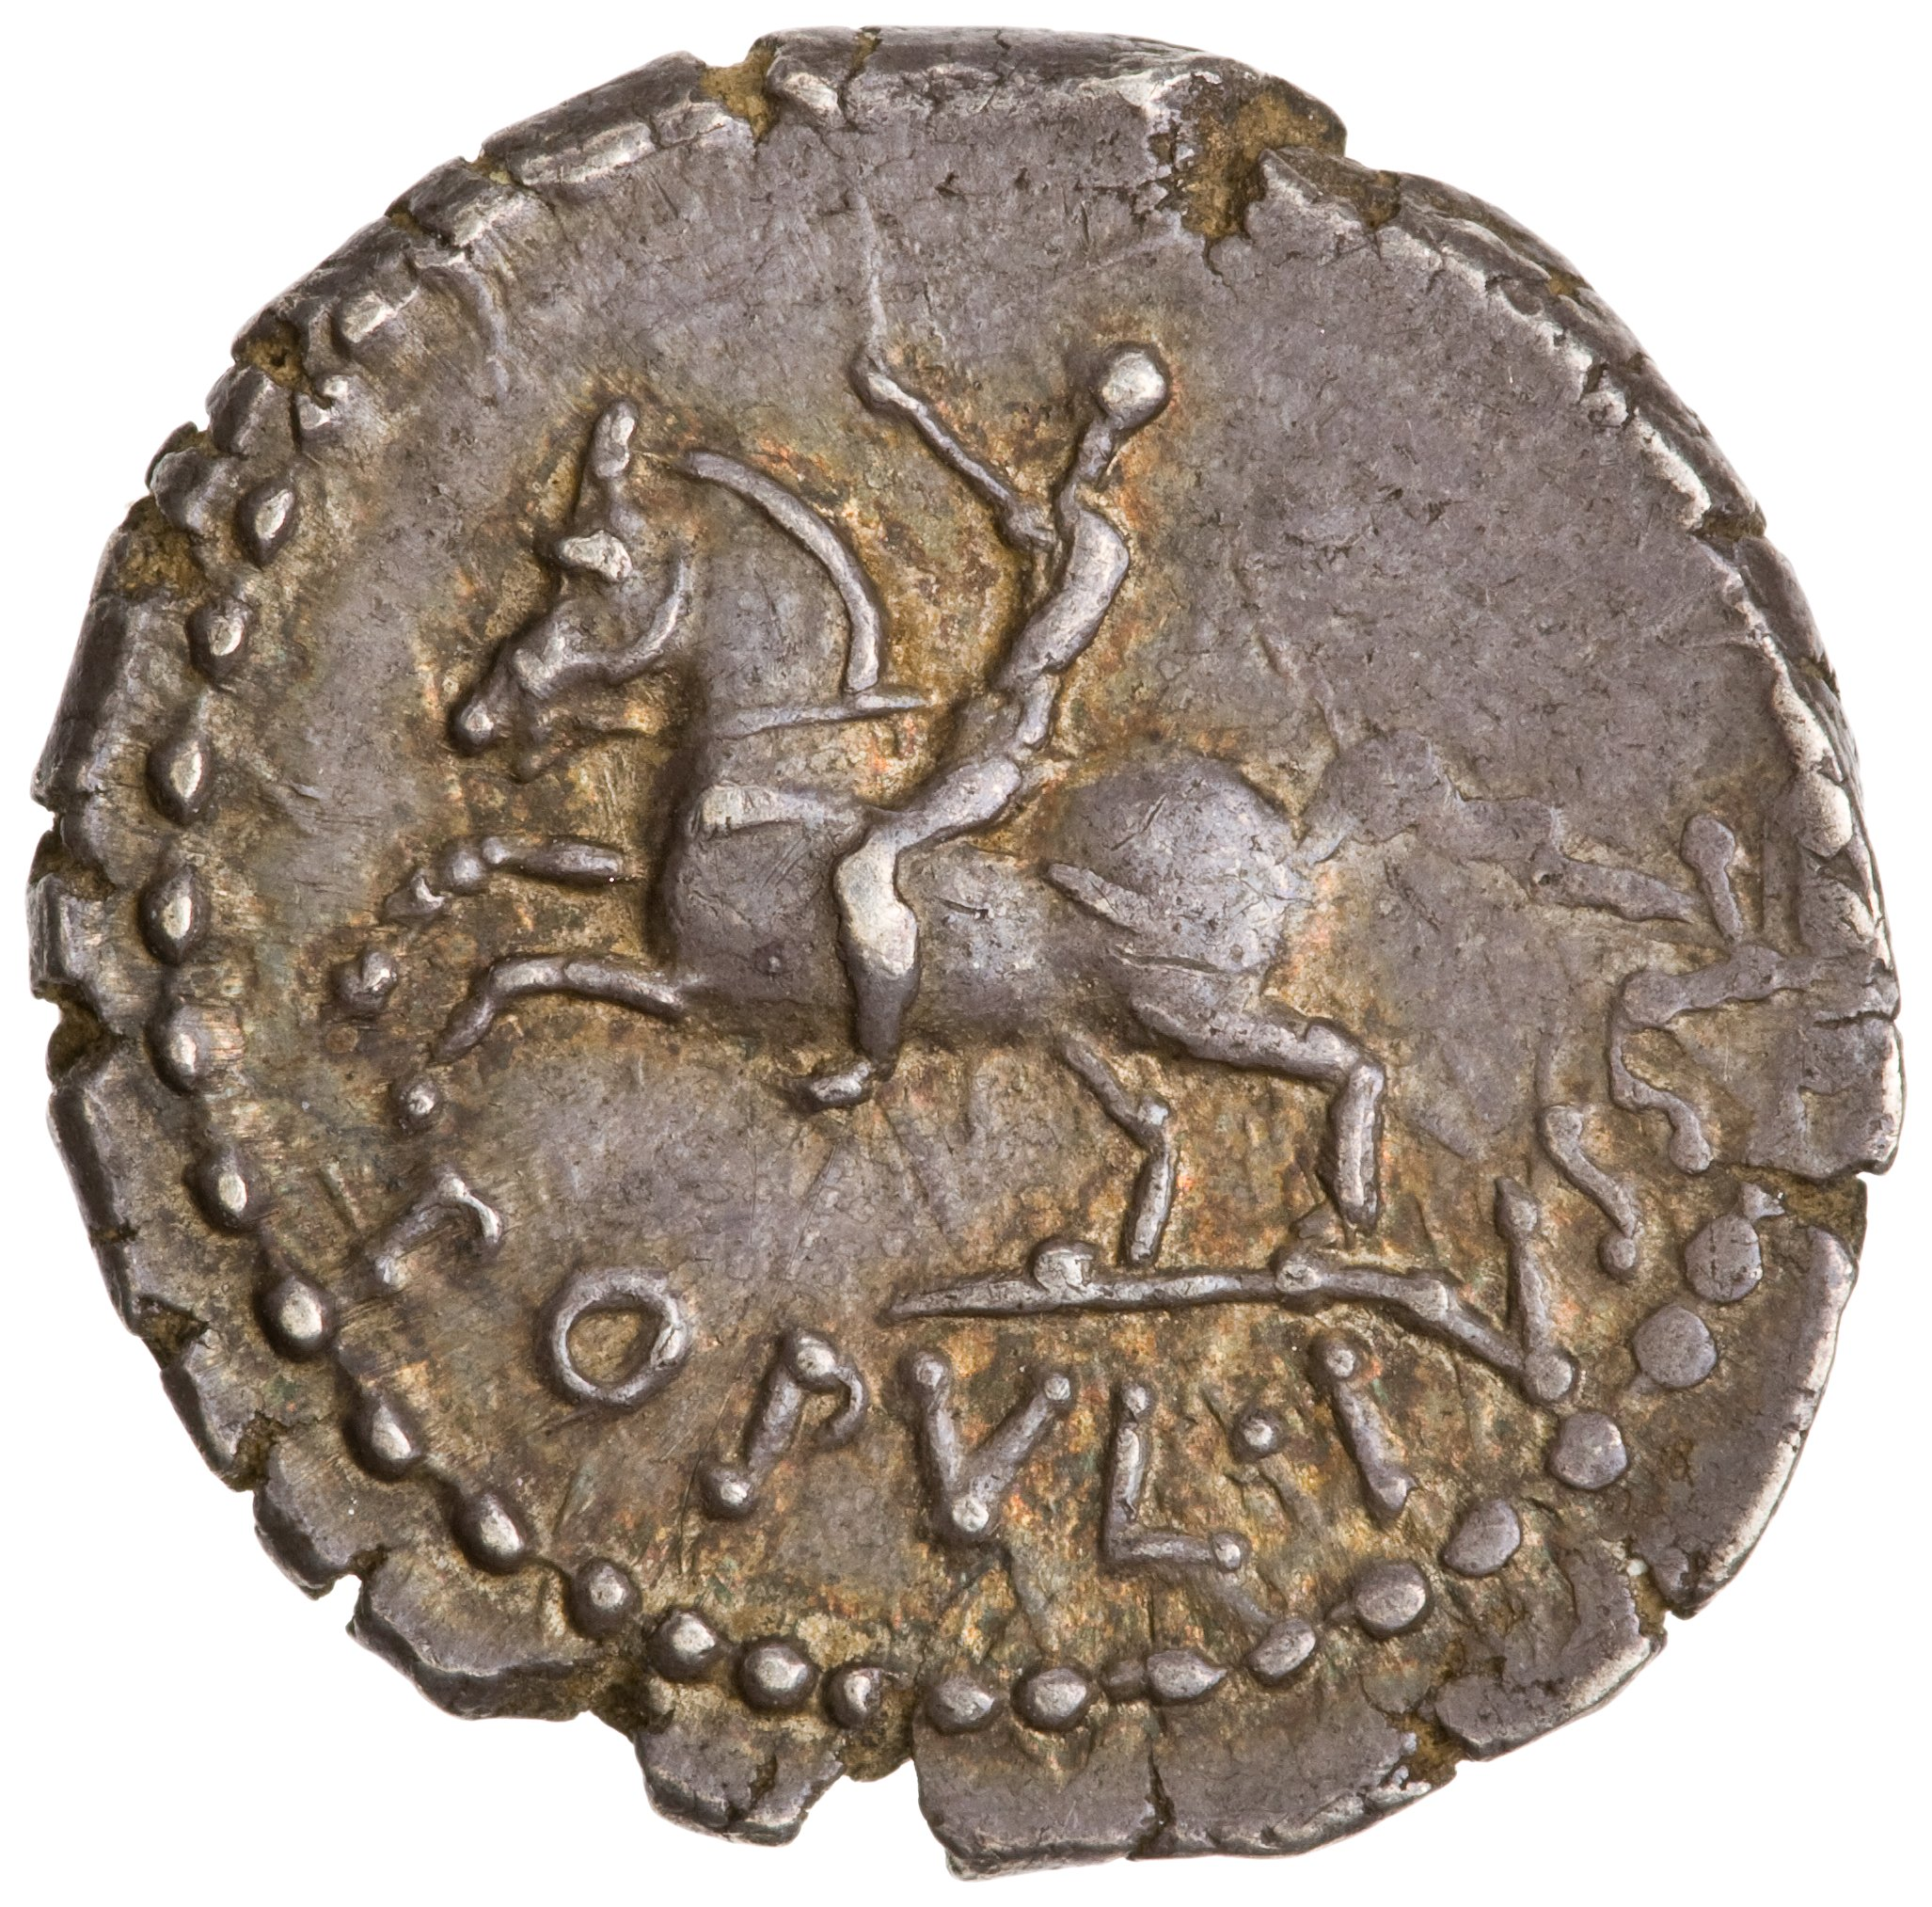 https://i1.wp.com/numismatics.org/collectionimages/19001949/1944/1944.100.4790.rev.noscale.jpg